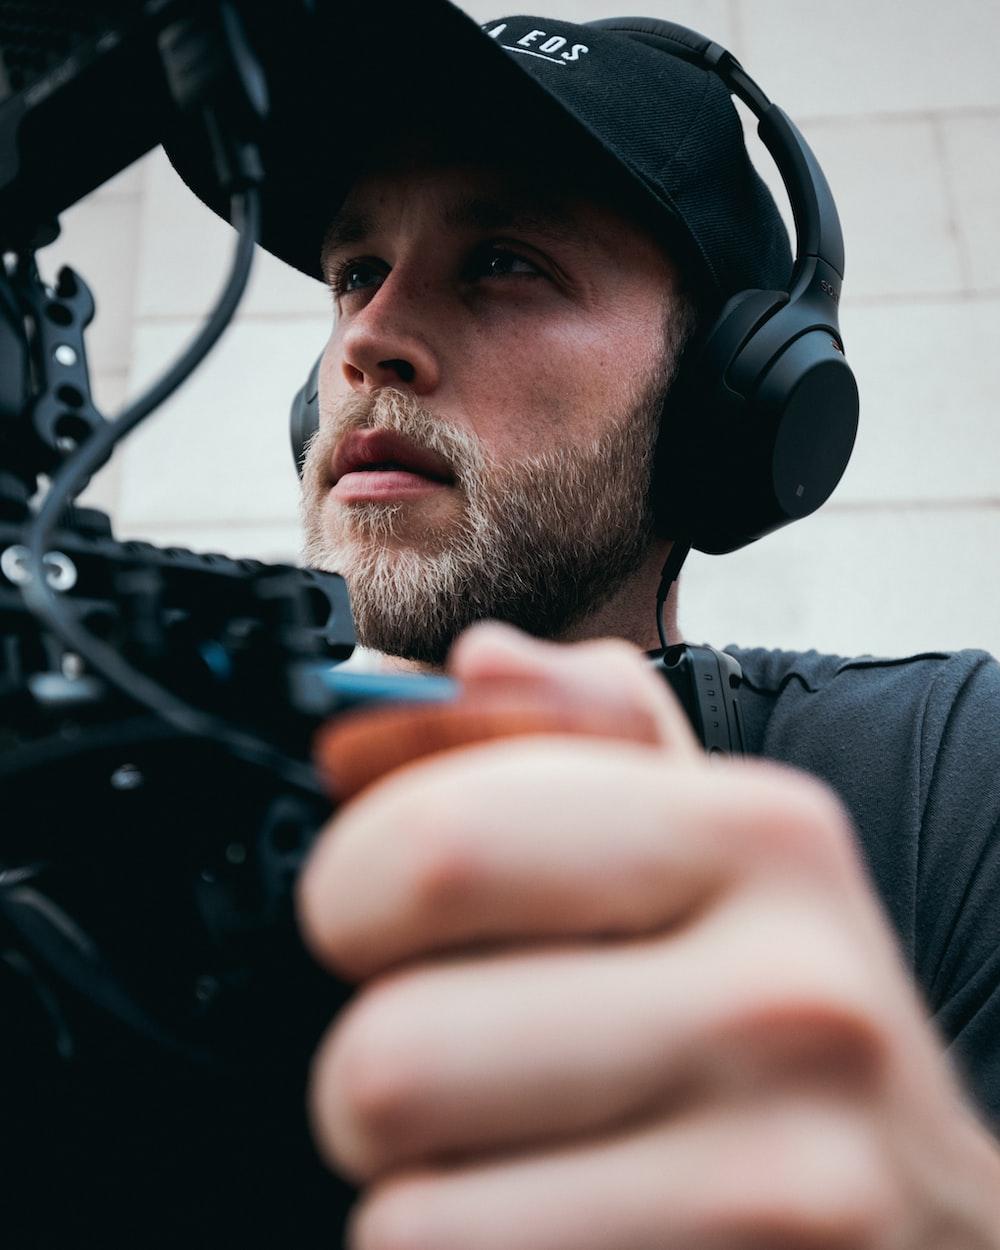 man in grey shirt wearing black headphones